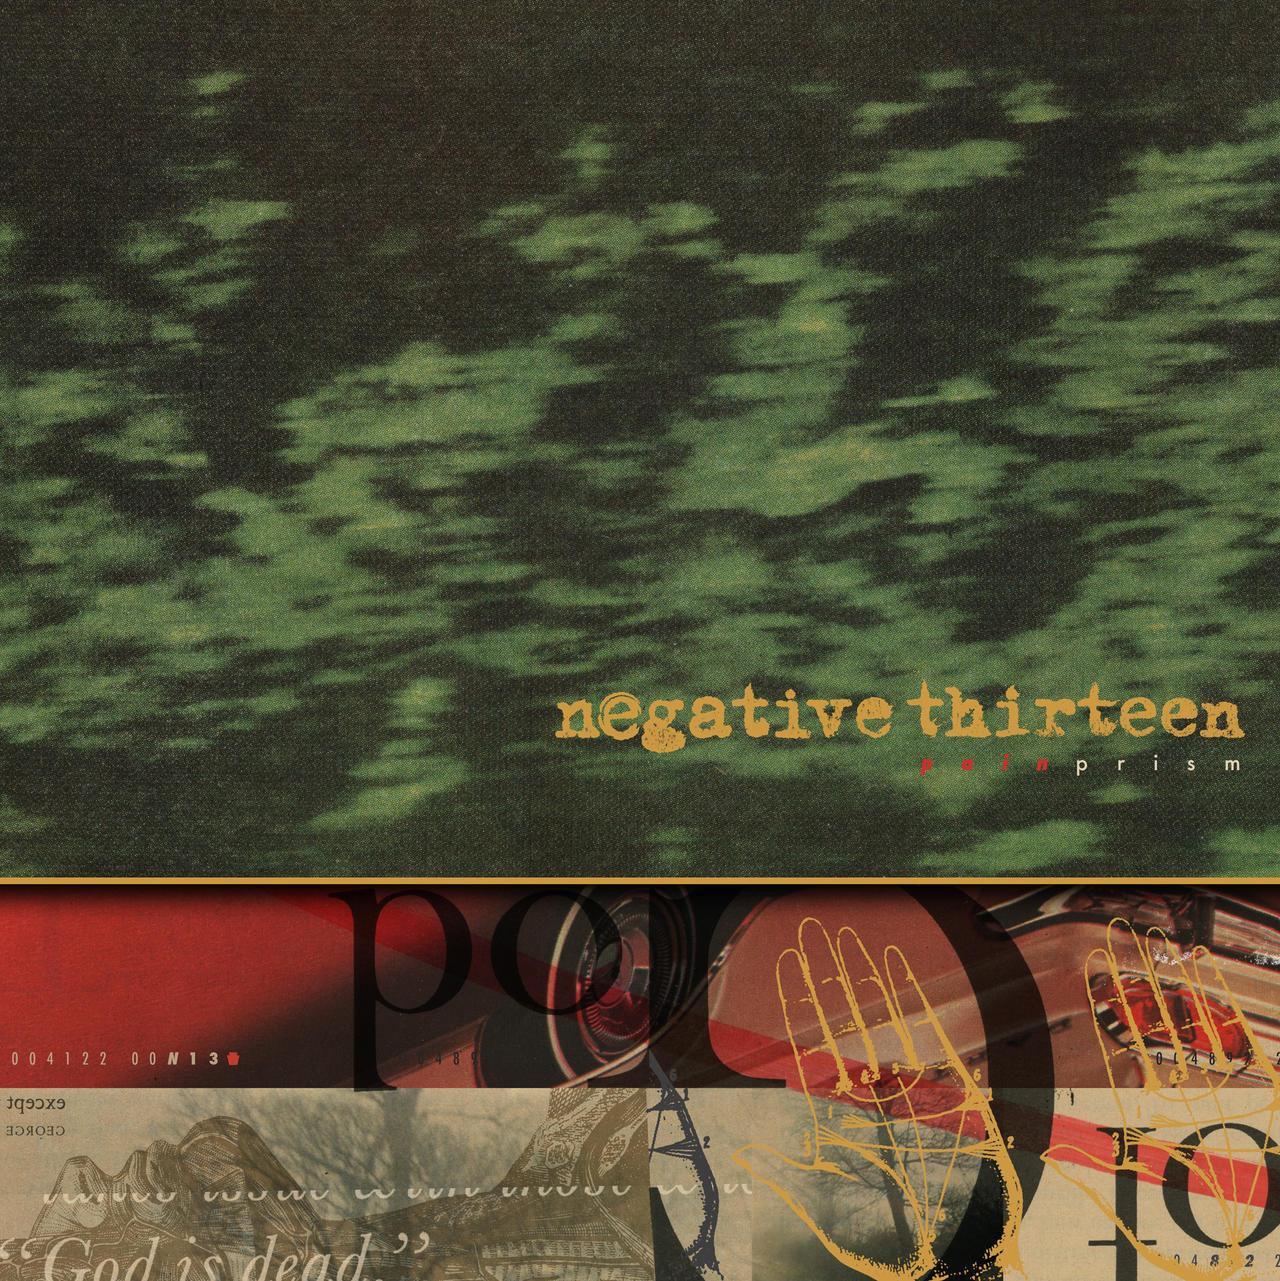 NEGATIVE 13 PAIN PRISM COVER